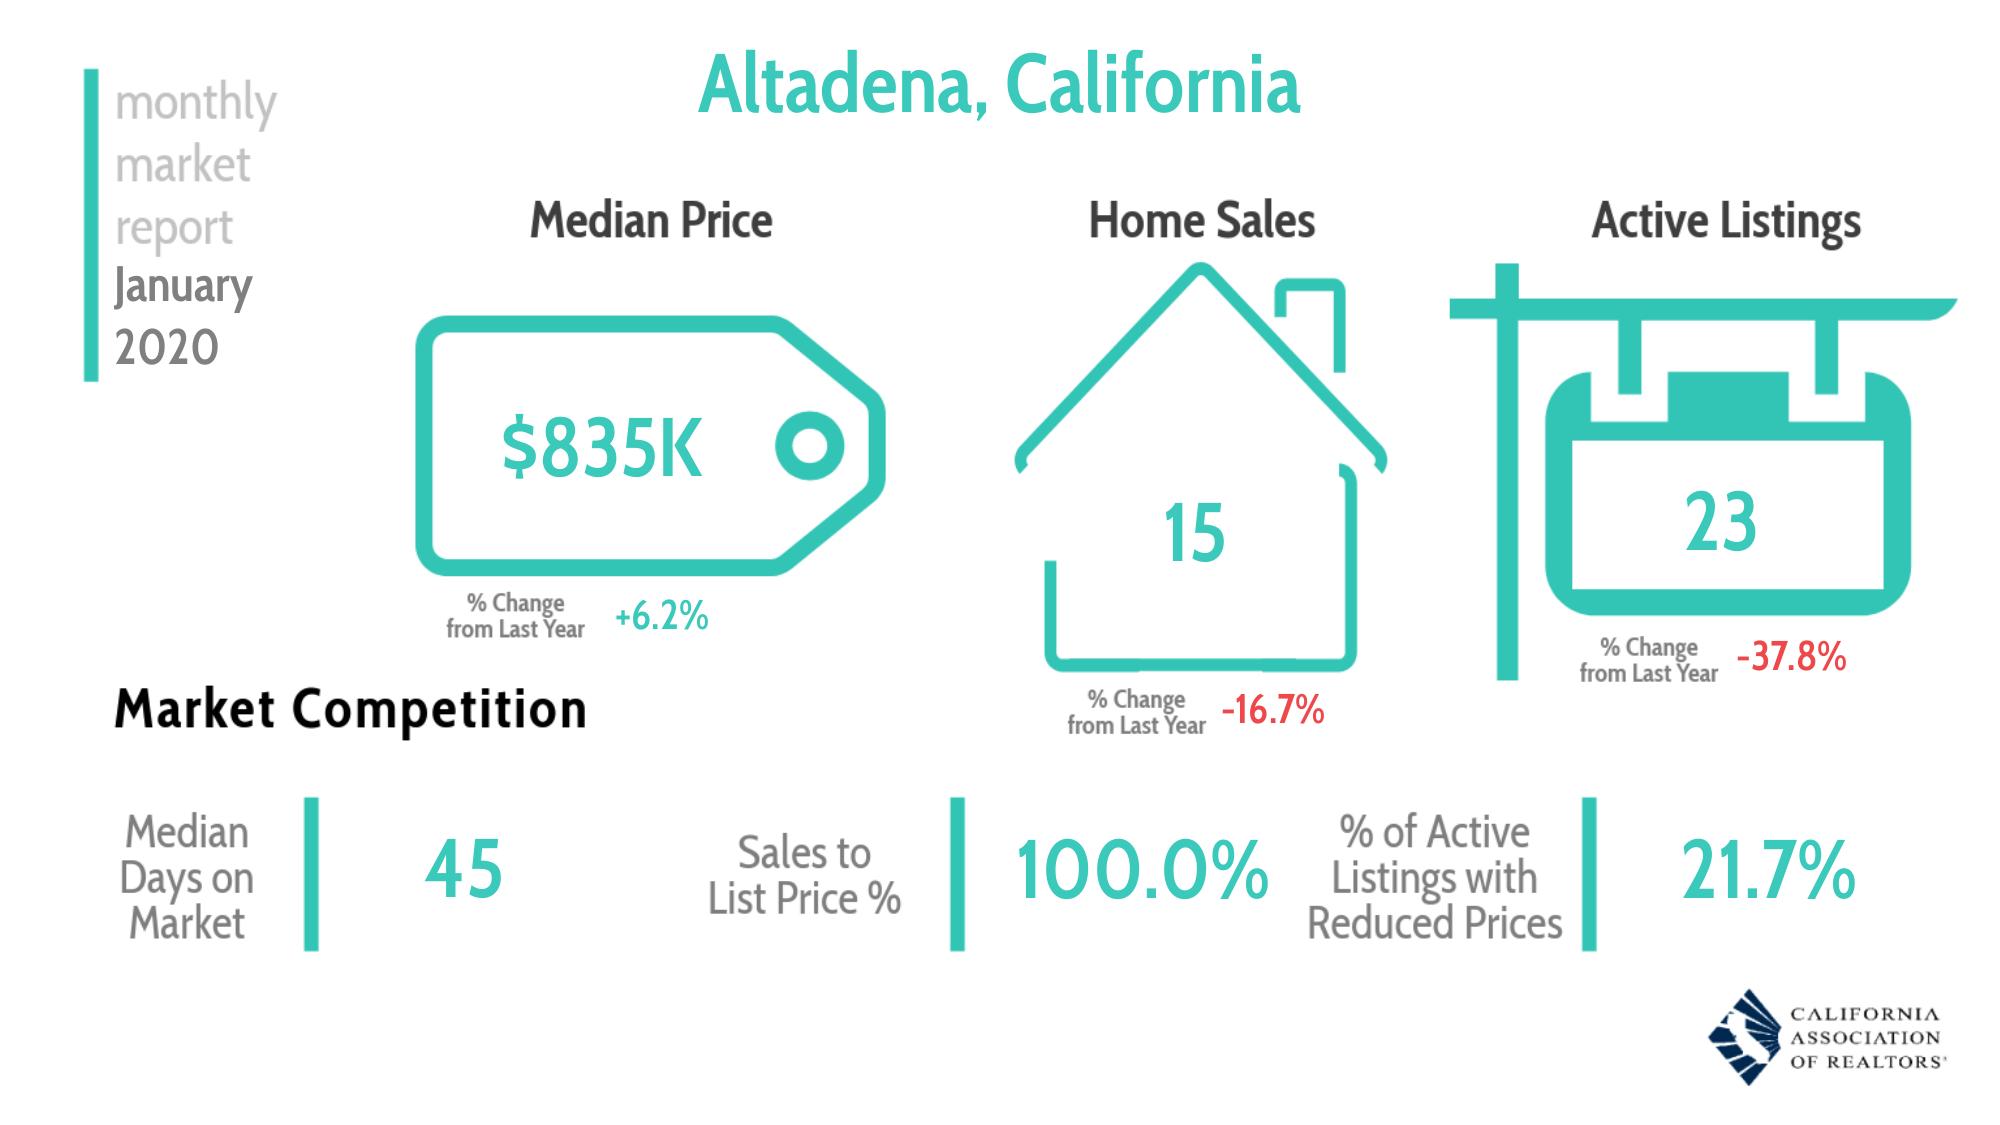 Altadena Real Estate Market Report January 2020